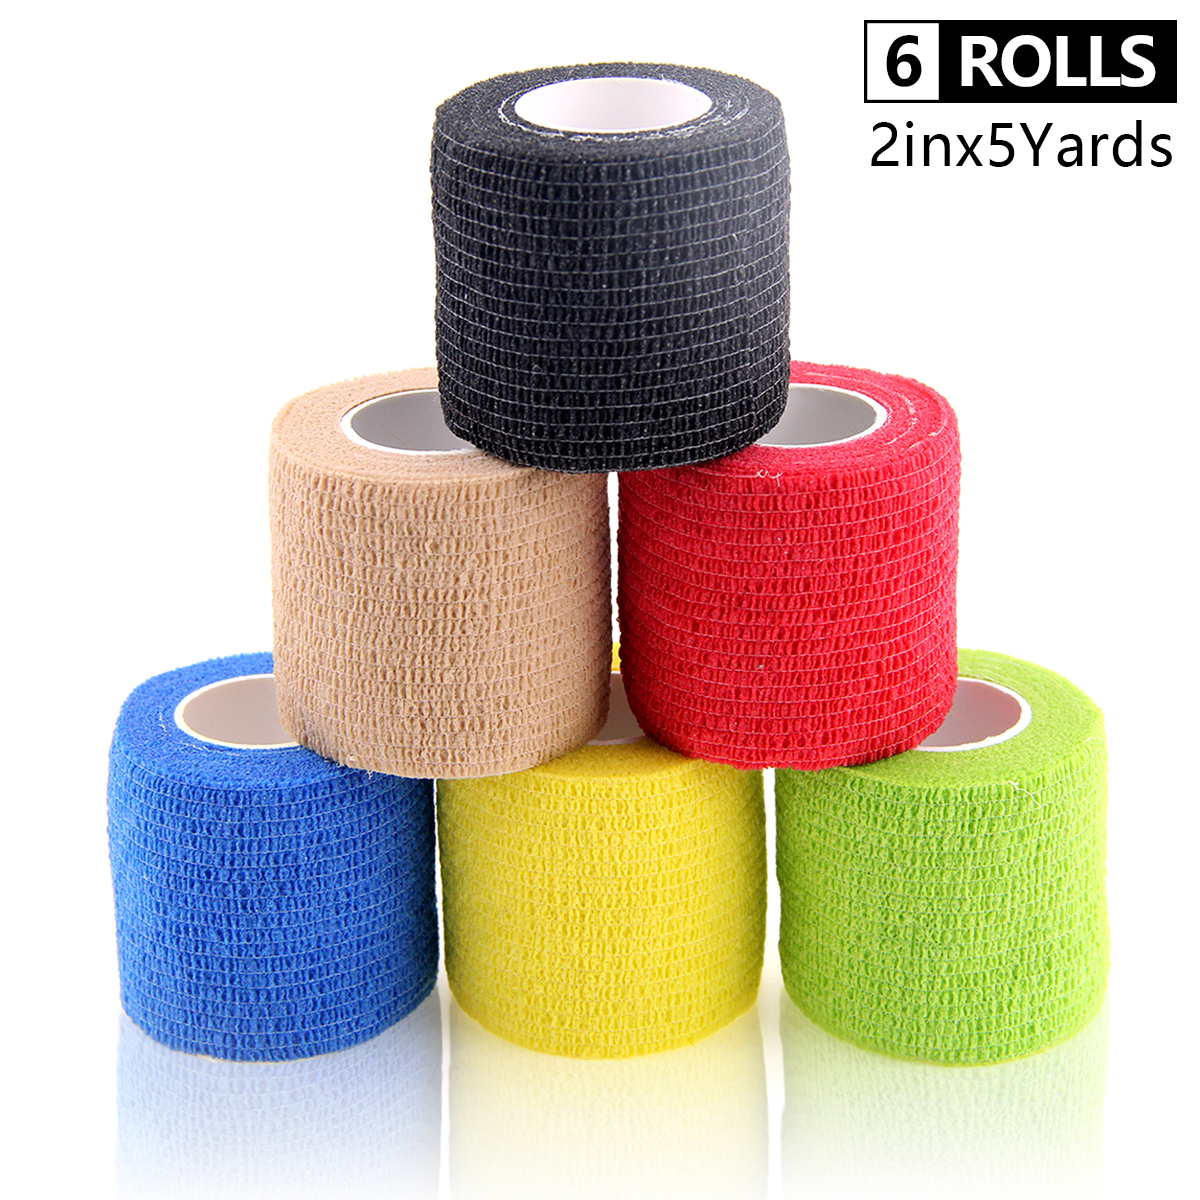 6 Rolls Selbst-Adhesive Verband Wasserdicht Vlies Gym Übung Sport Band Atmungs Handgelenk Wraps Cohesive Bandage 5cm * 4,5 m